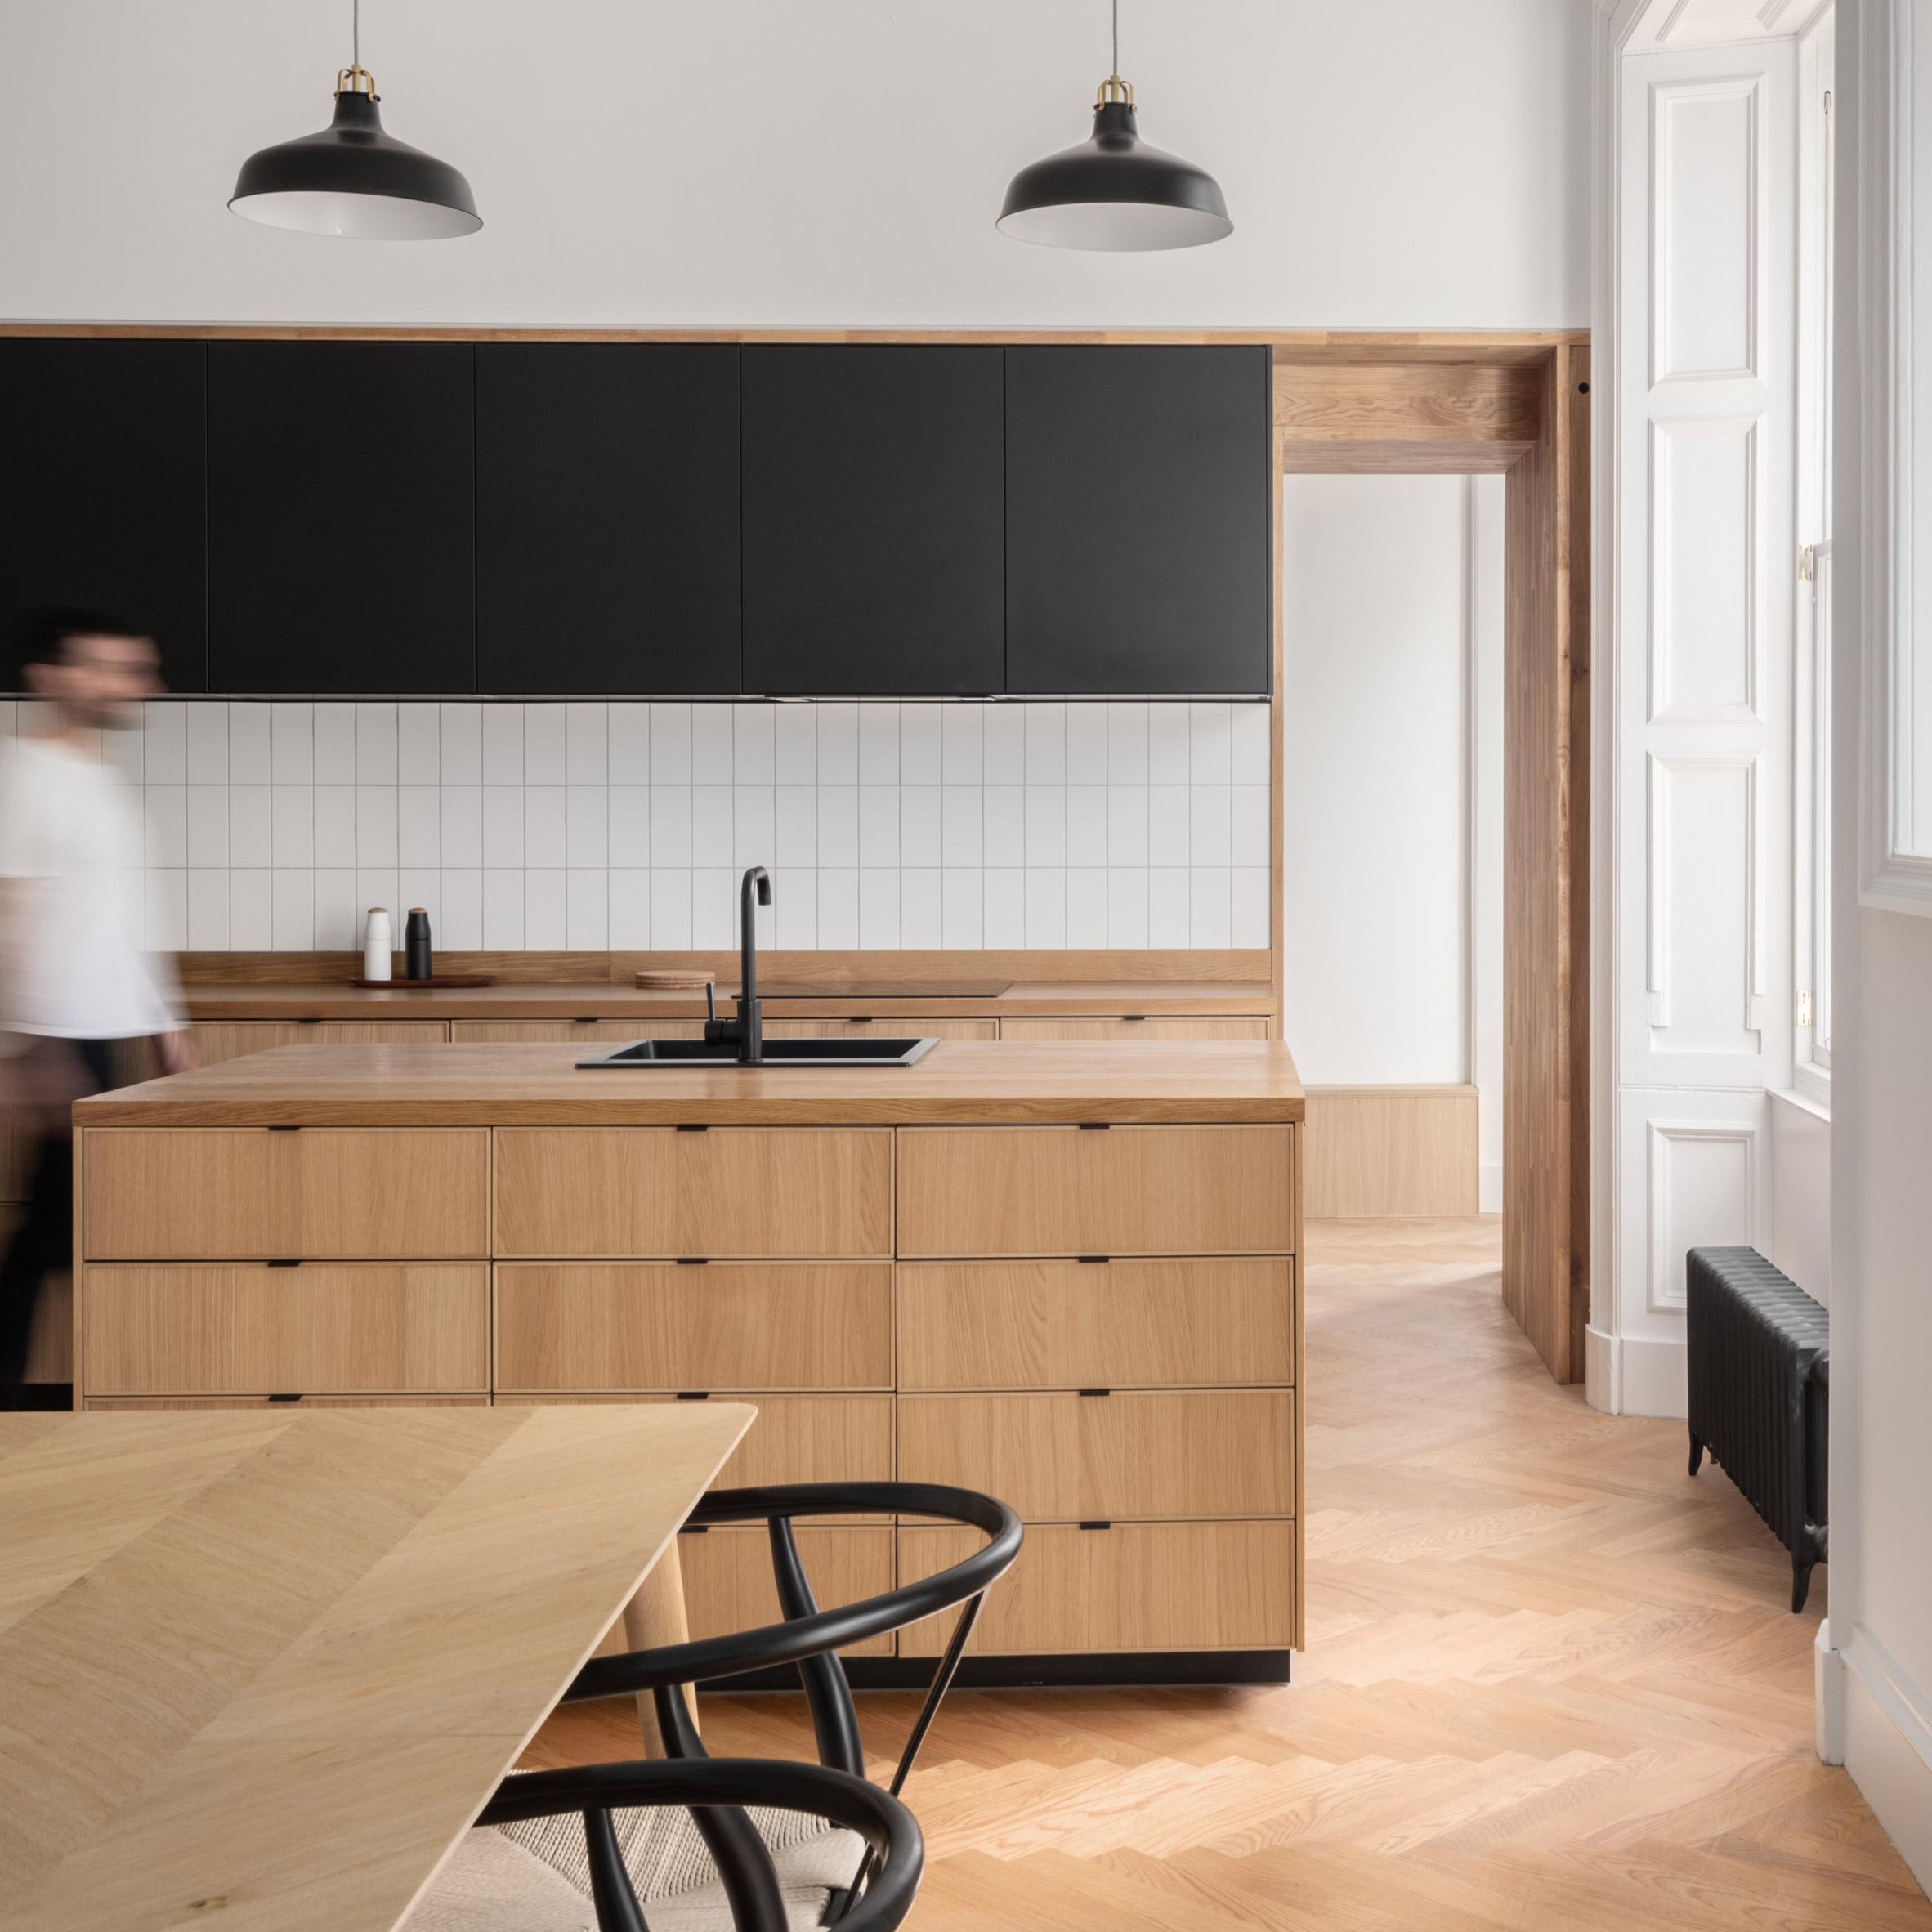 Architect duo turn Edinburgh apartment into modern living space